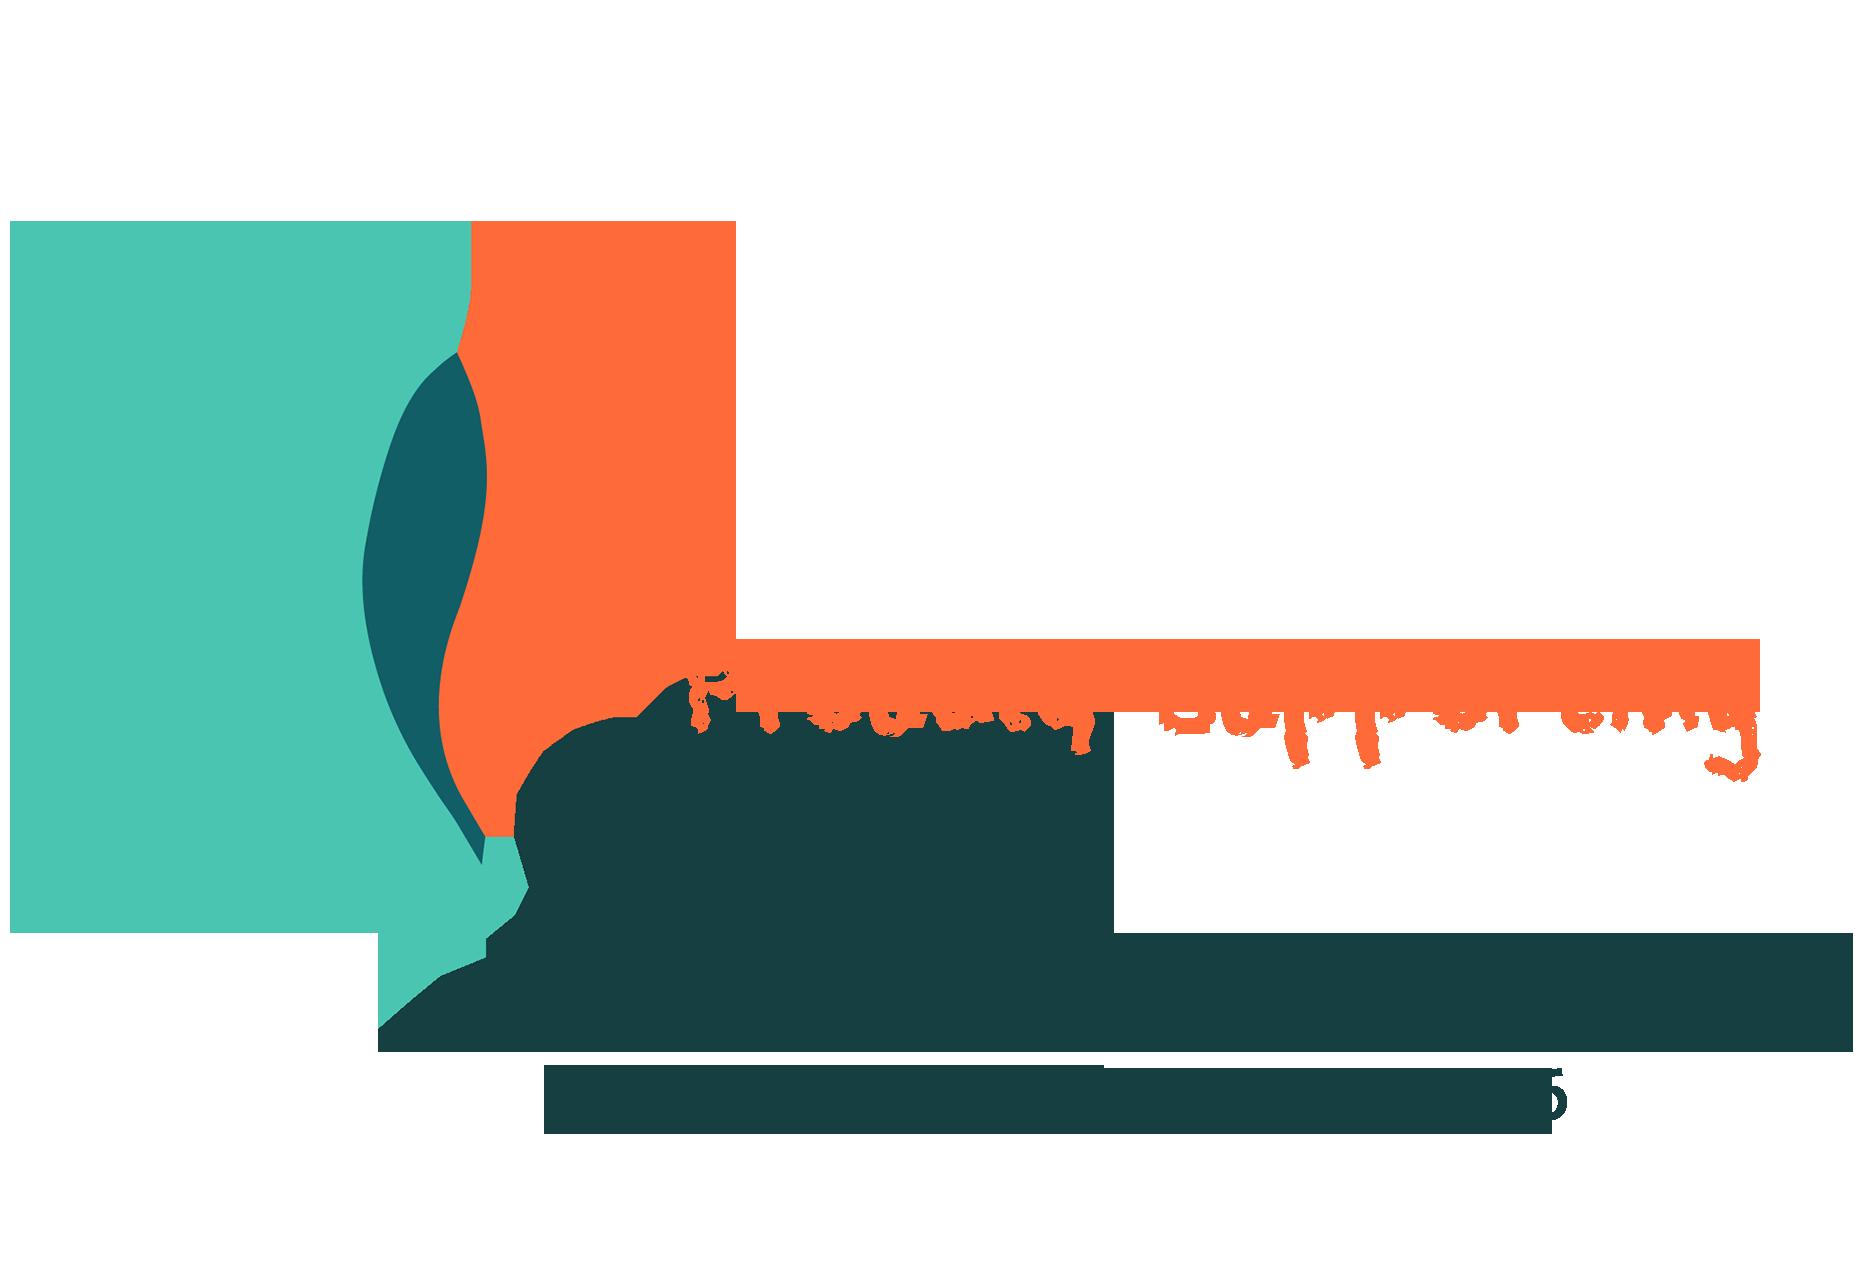 I'm proud to be a Community Champion of PANDA. -